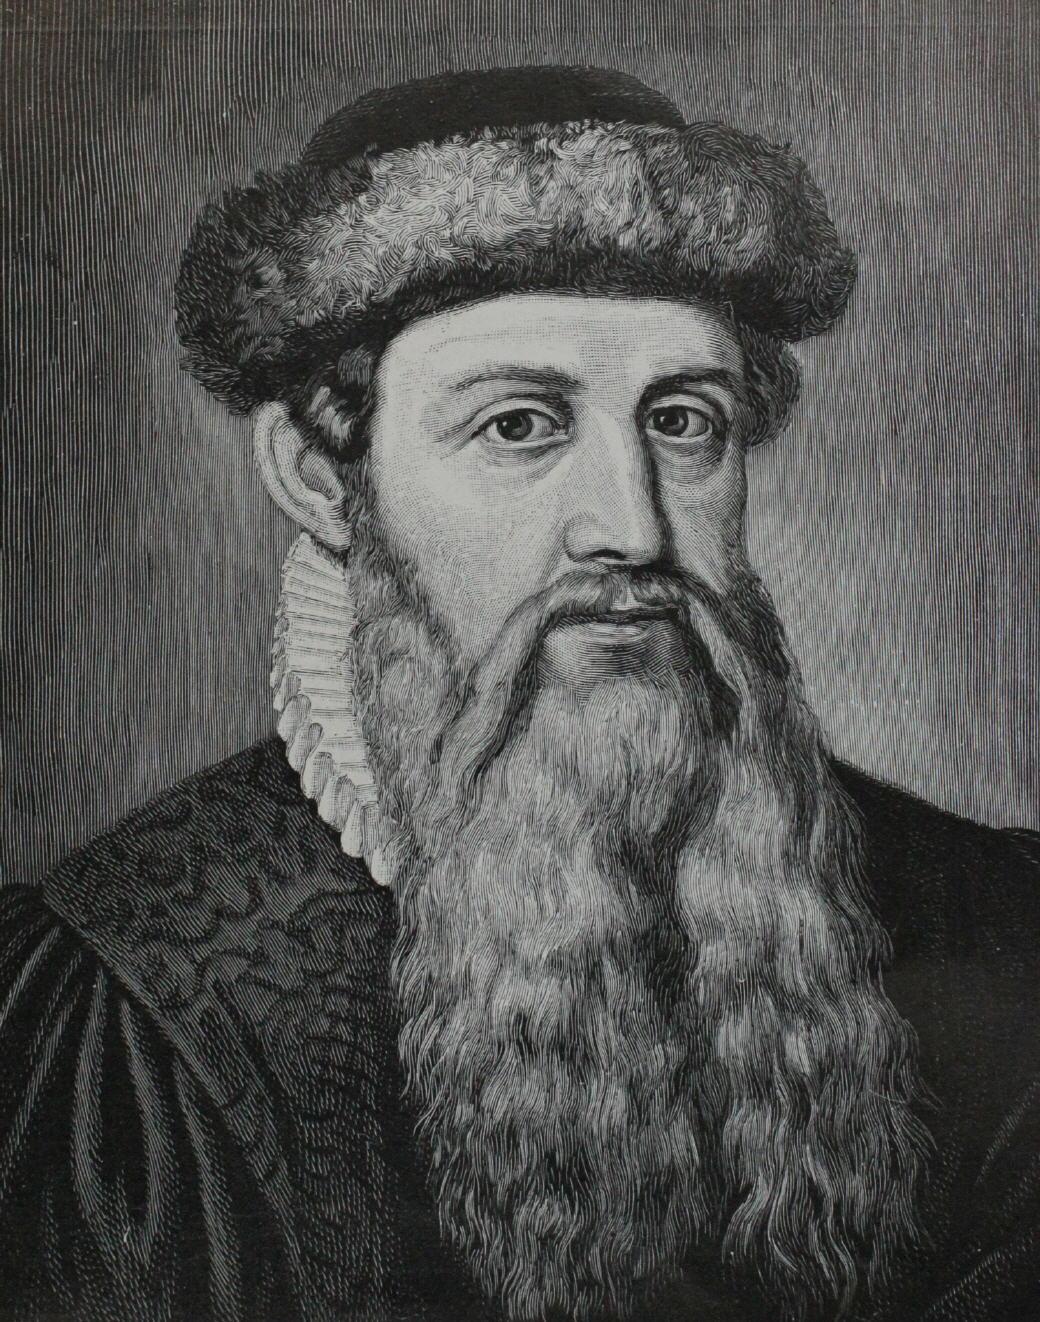 نظریه ی گیاه شناسی گوتنمبرگ (Gutenberg)